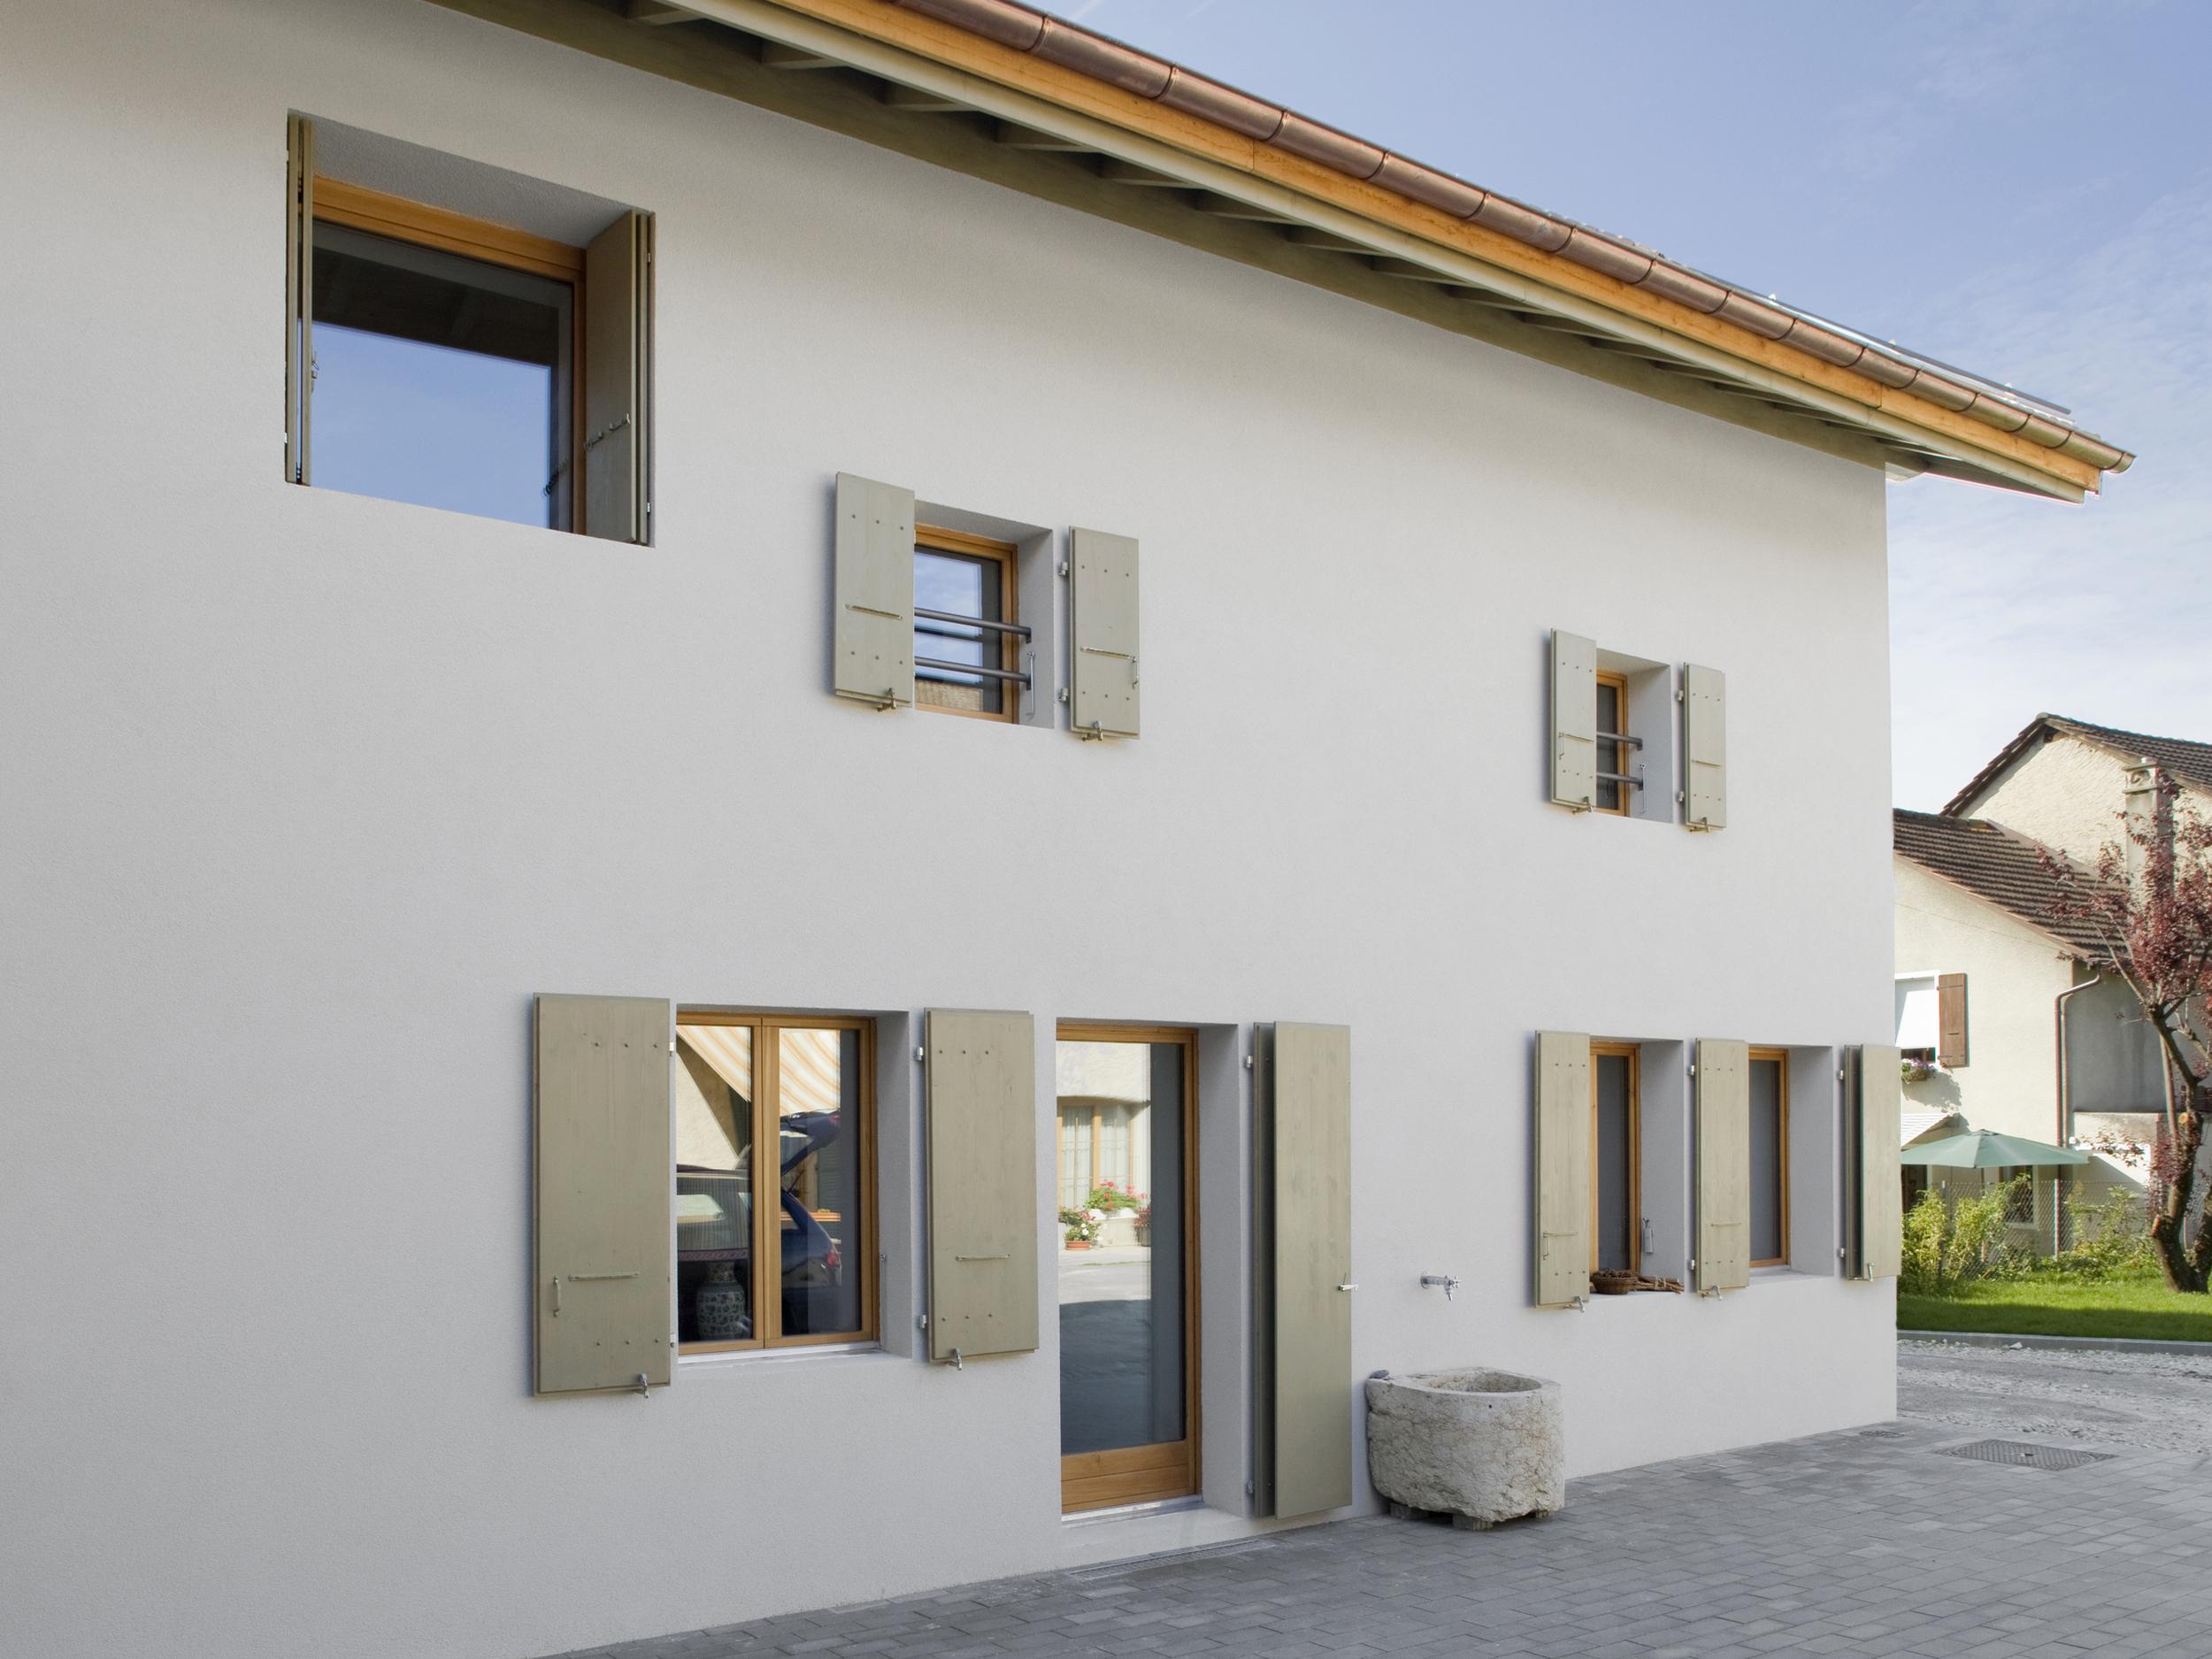 ATBA - architecture, Geneva | 2012